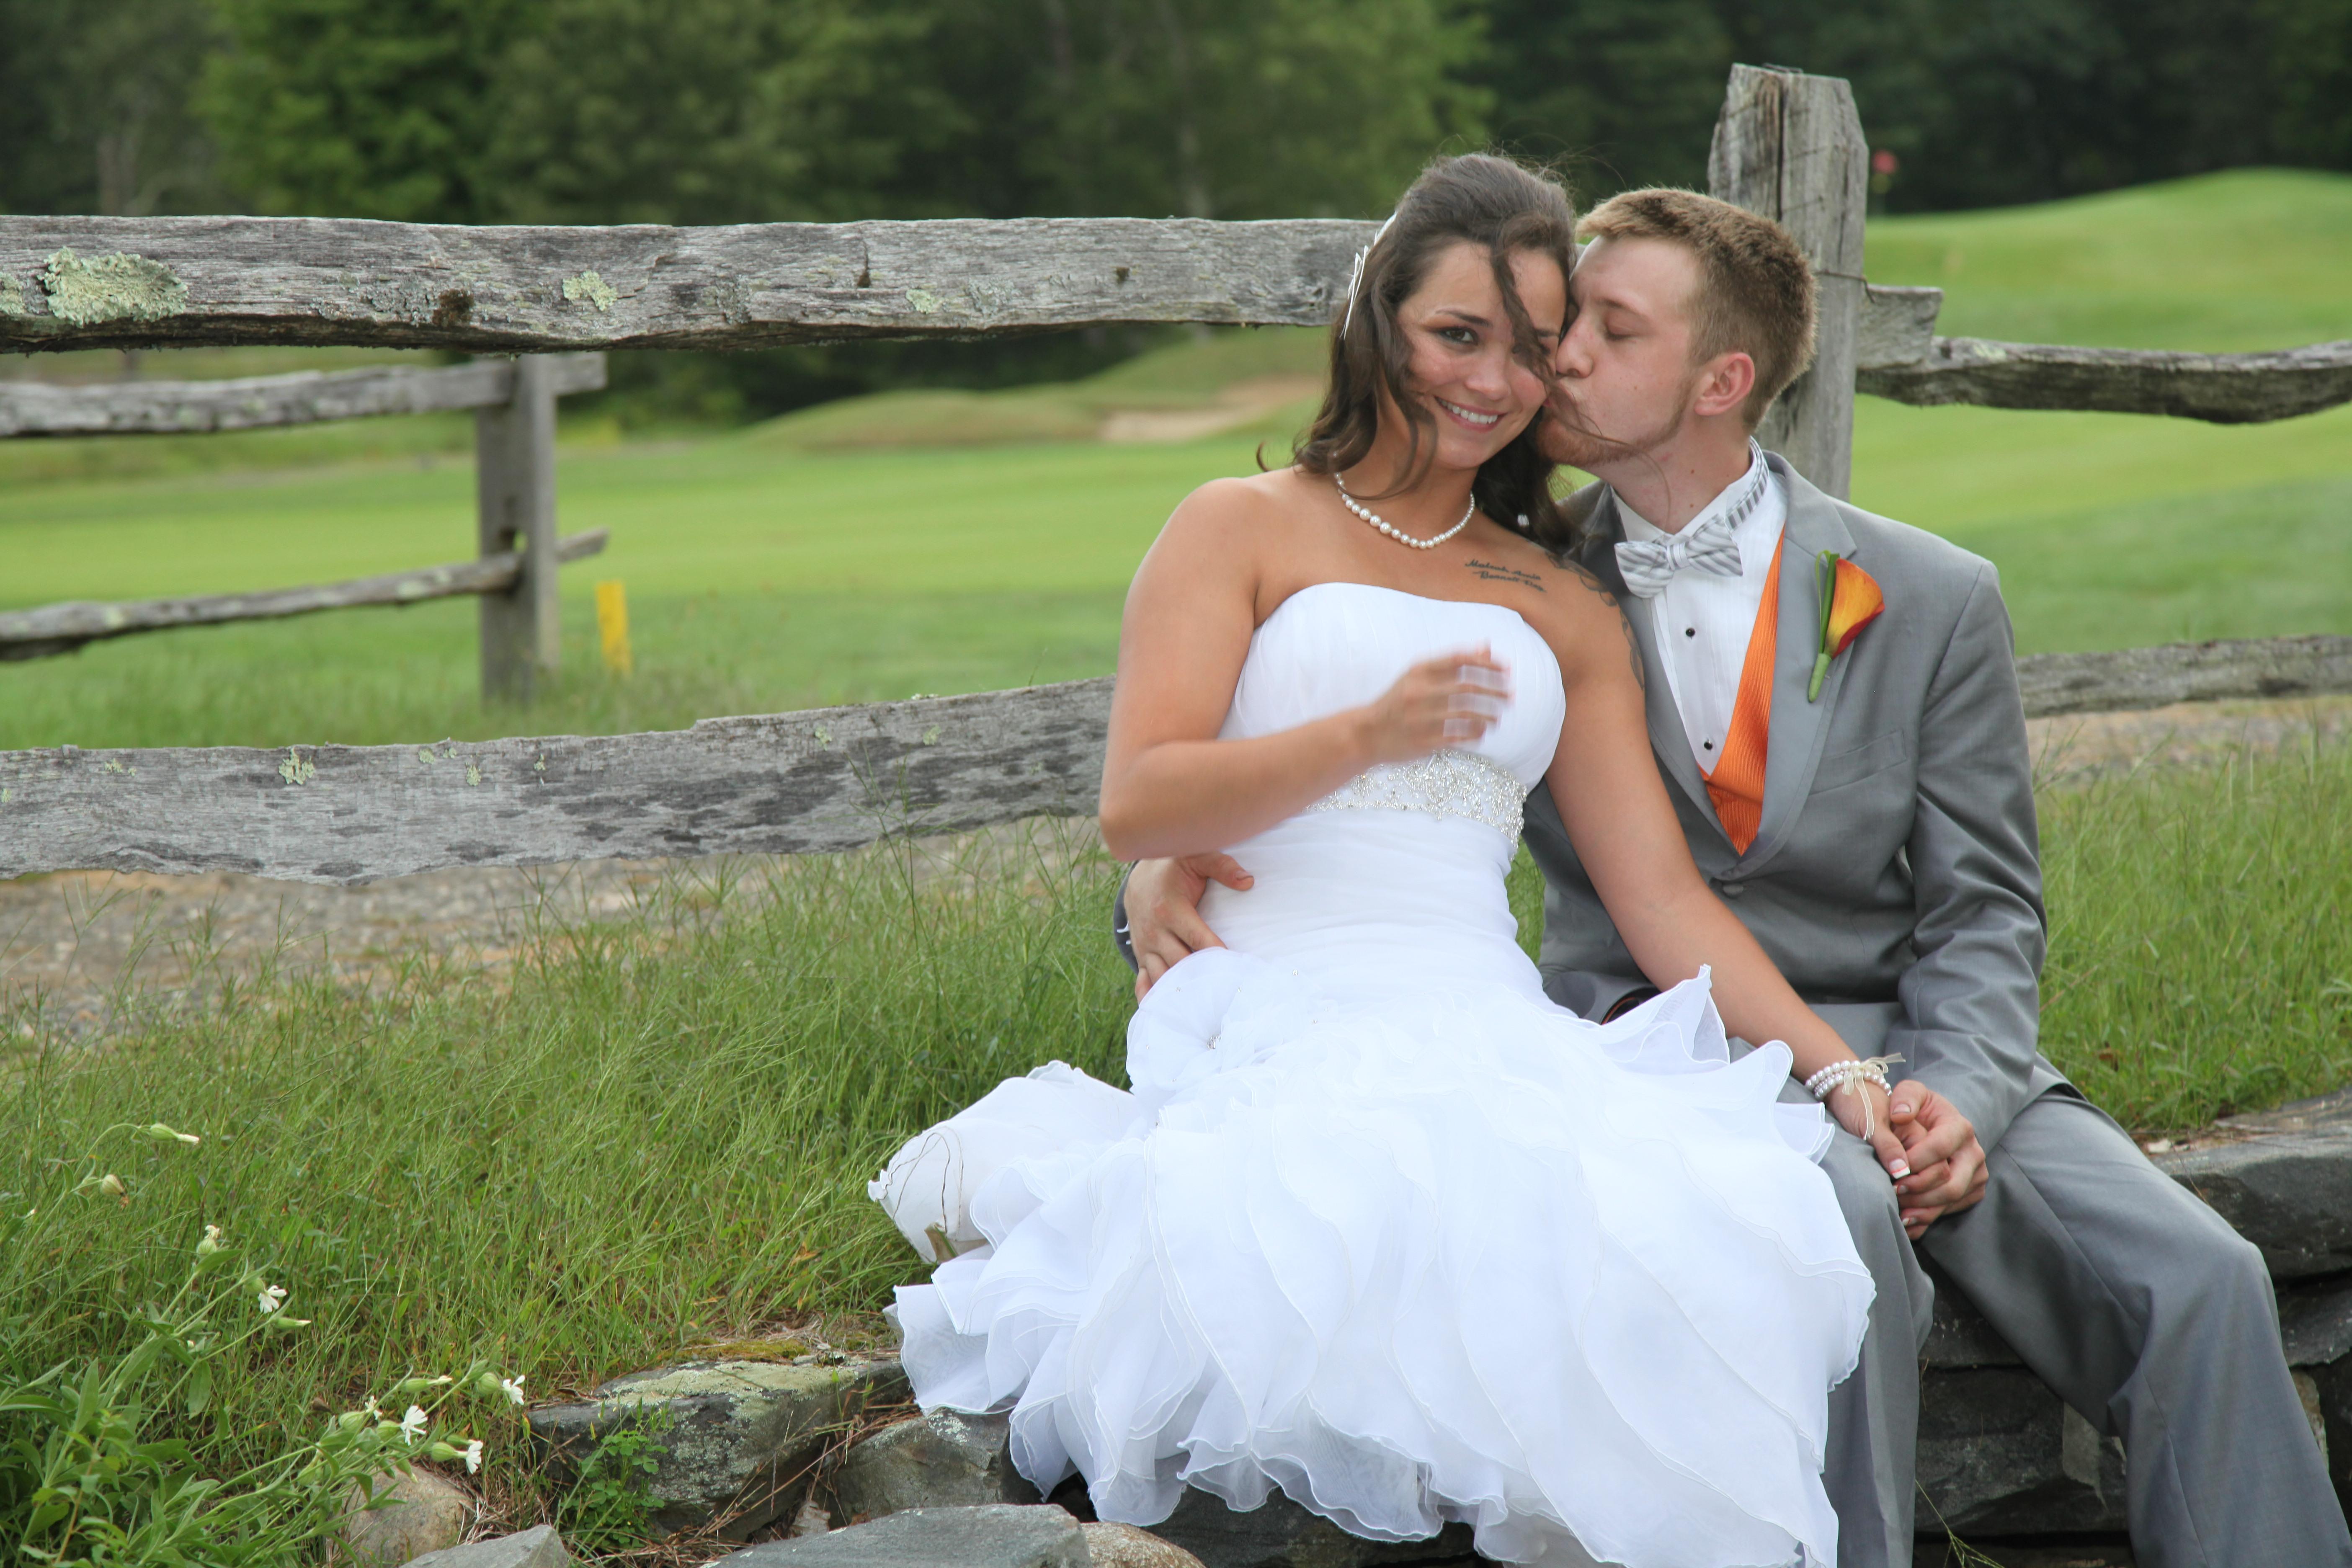 Wedding Kiss Fense